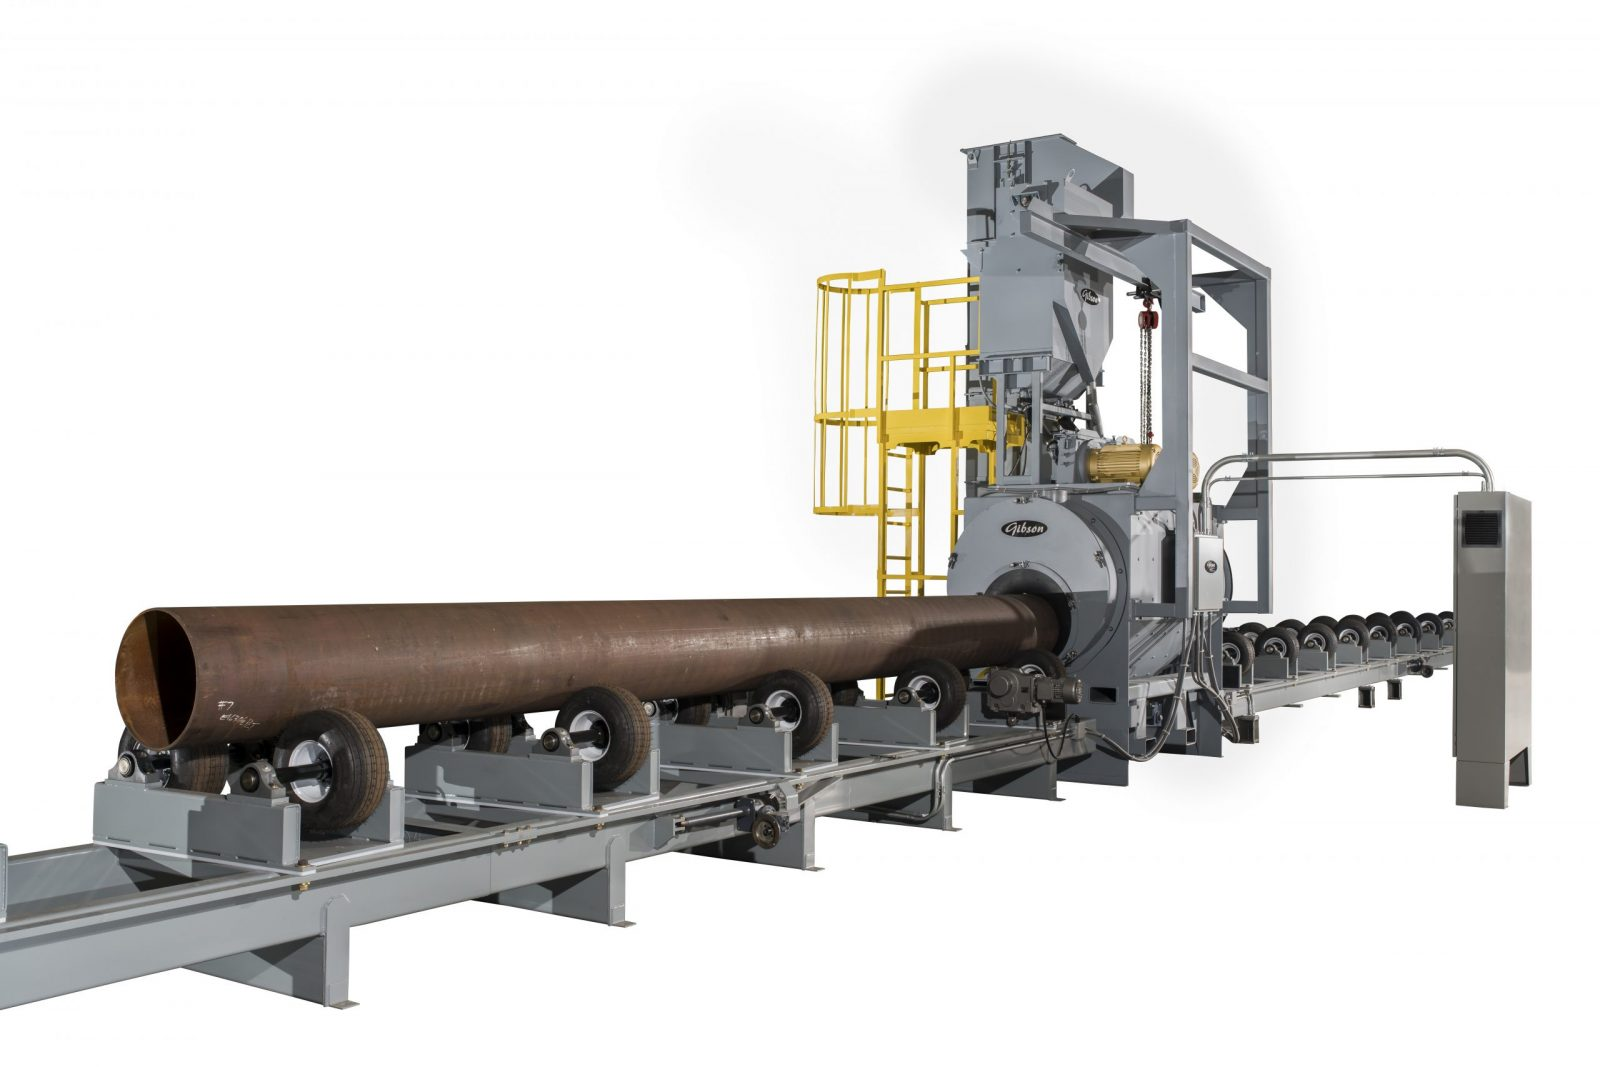 pipe blast system